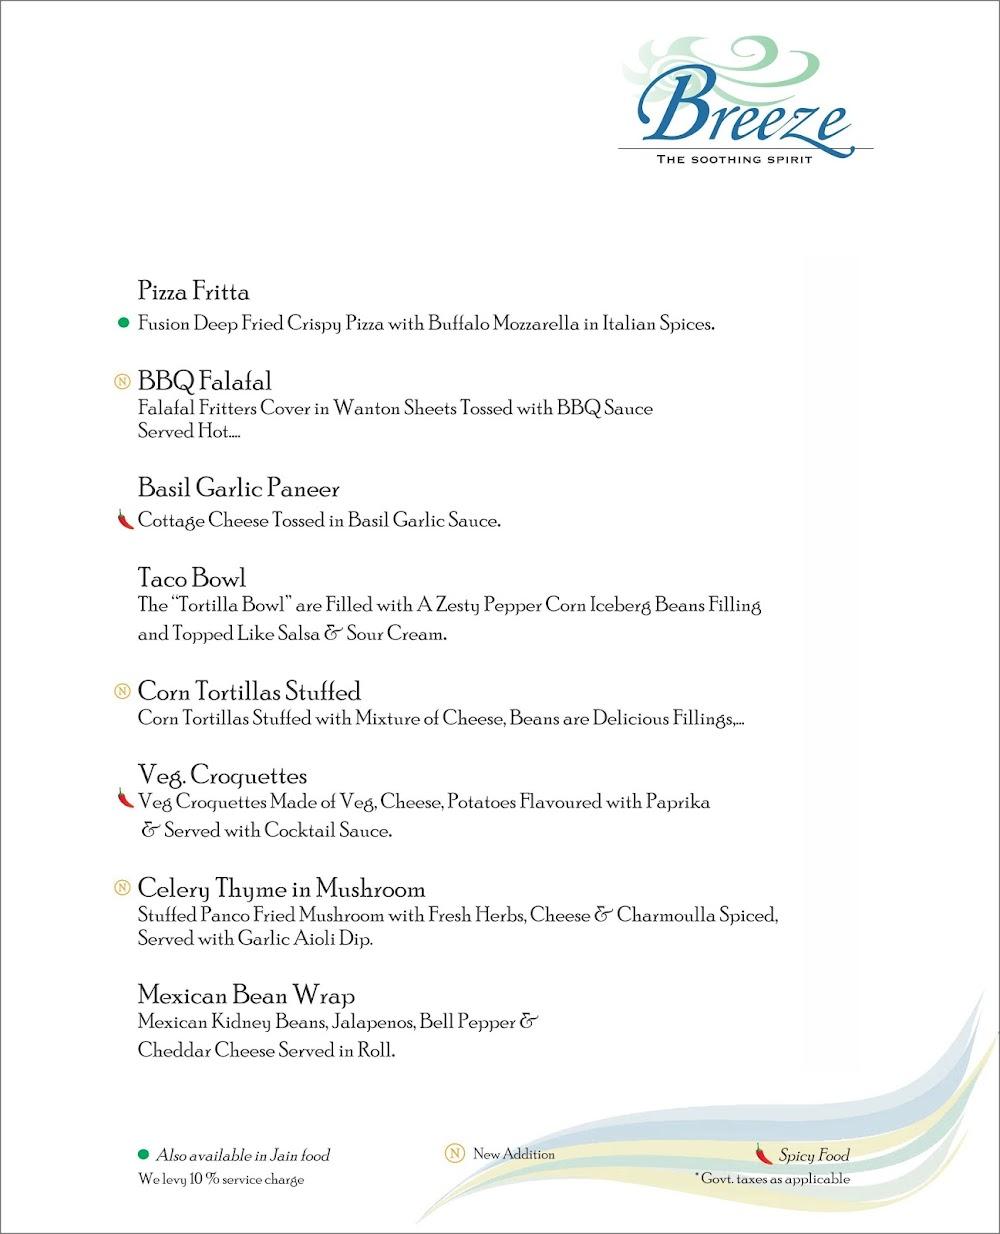 Breeze Lounge menu 3